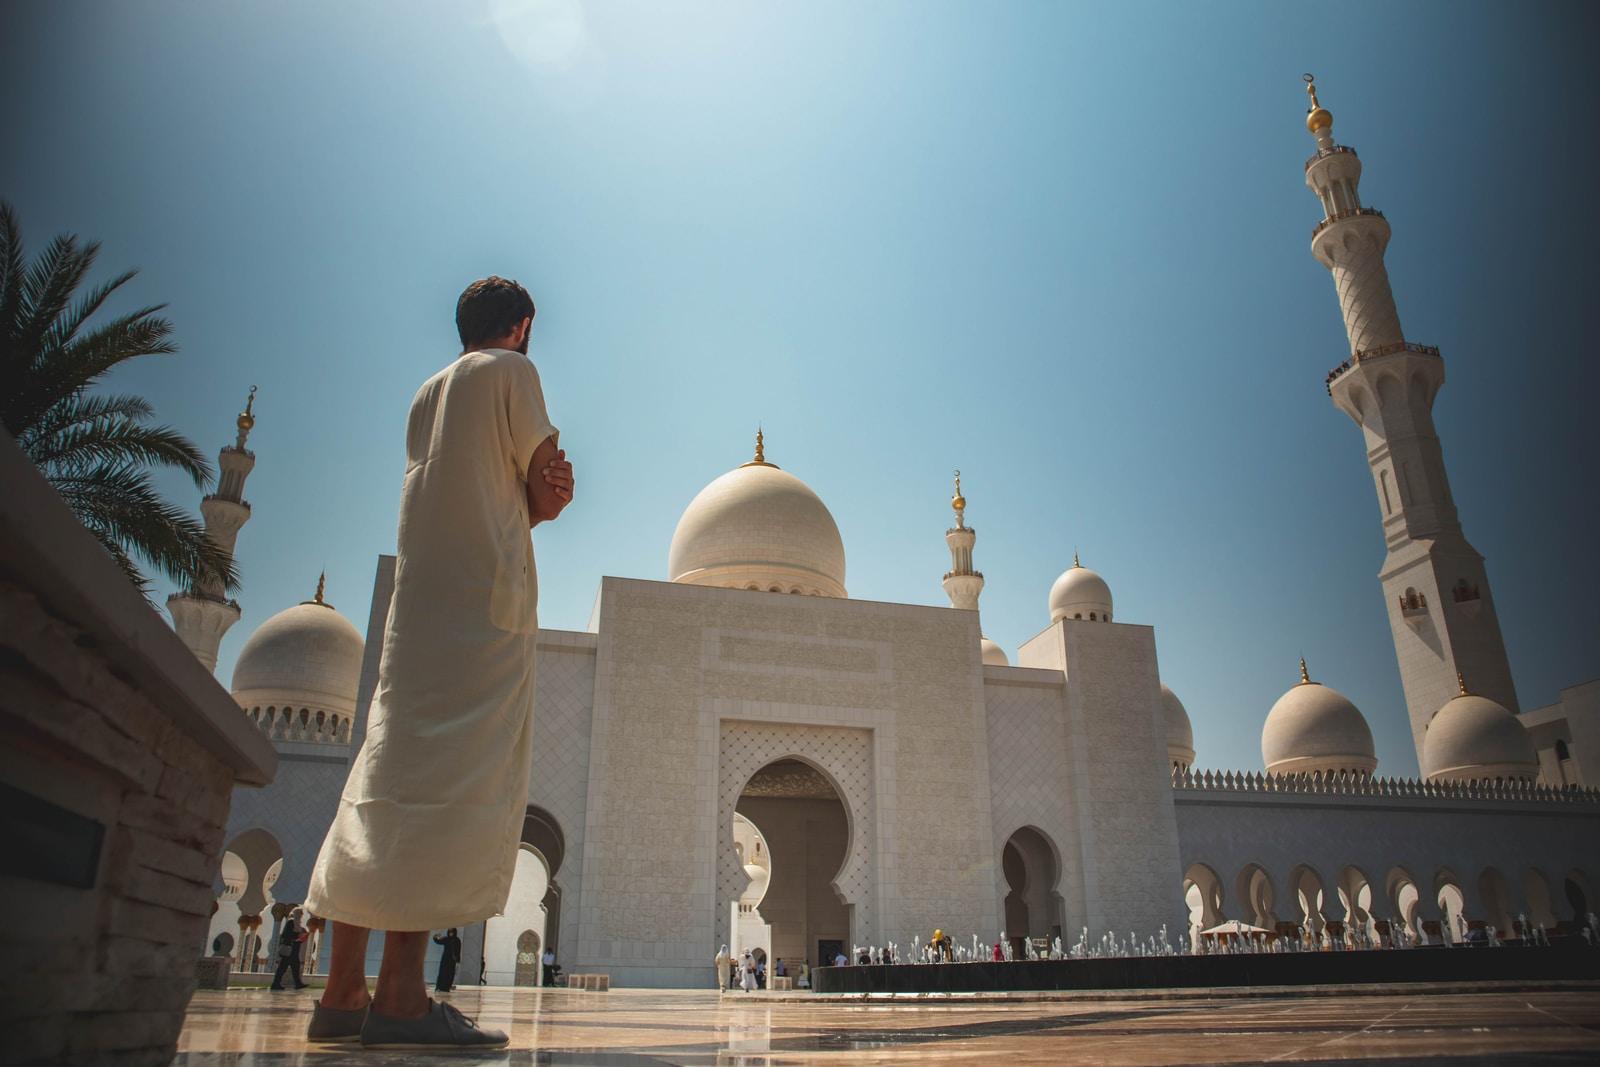 man standing near white mosque